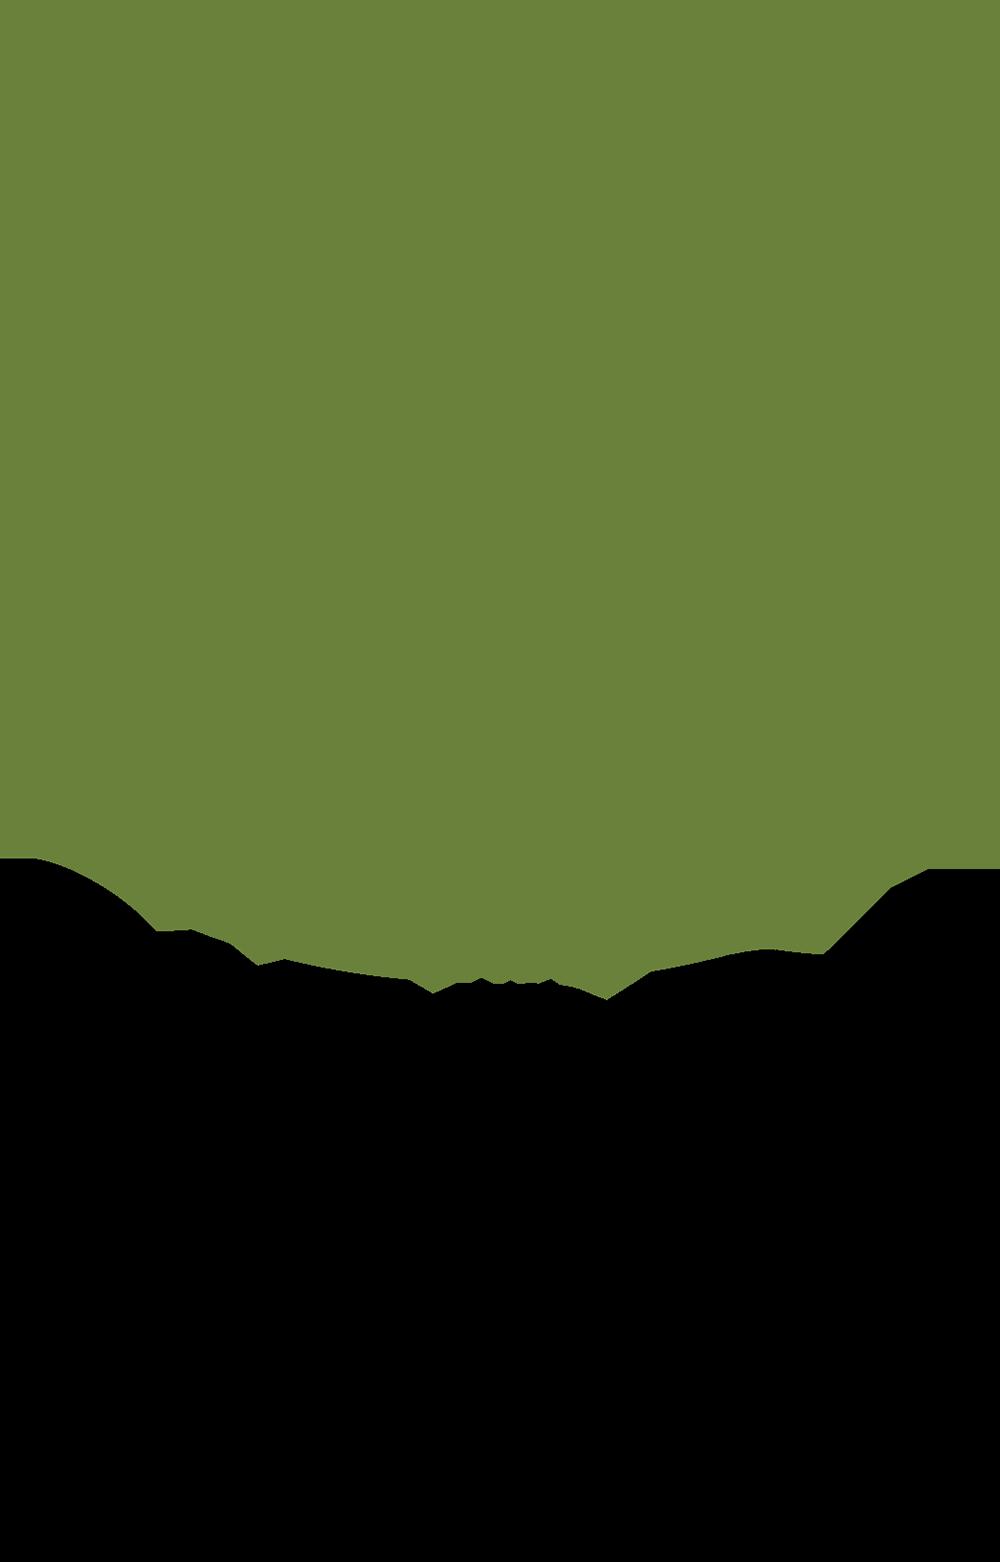 WENOCA Sierra Club